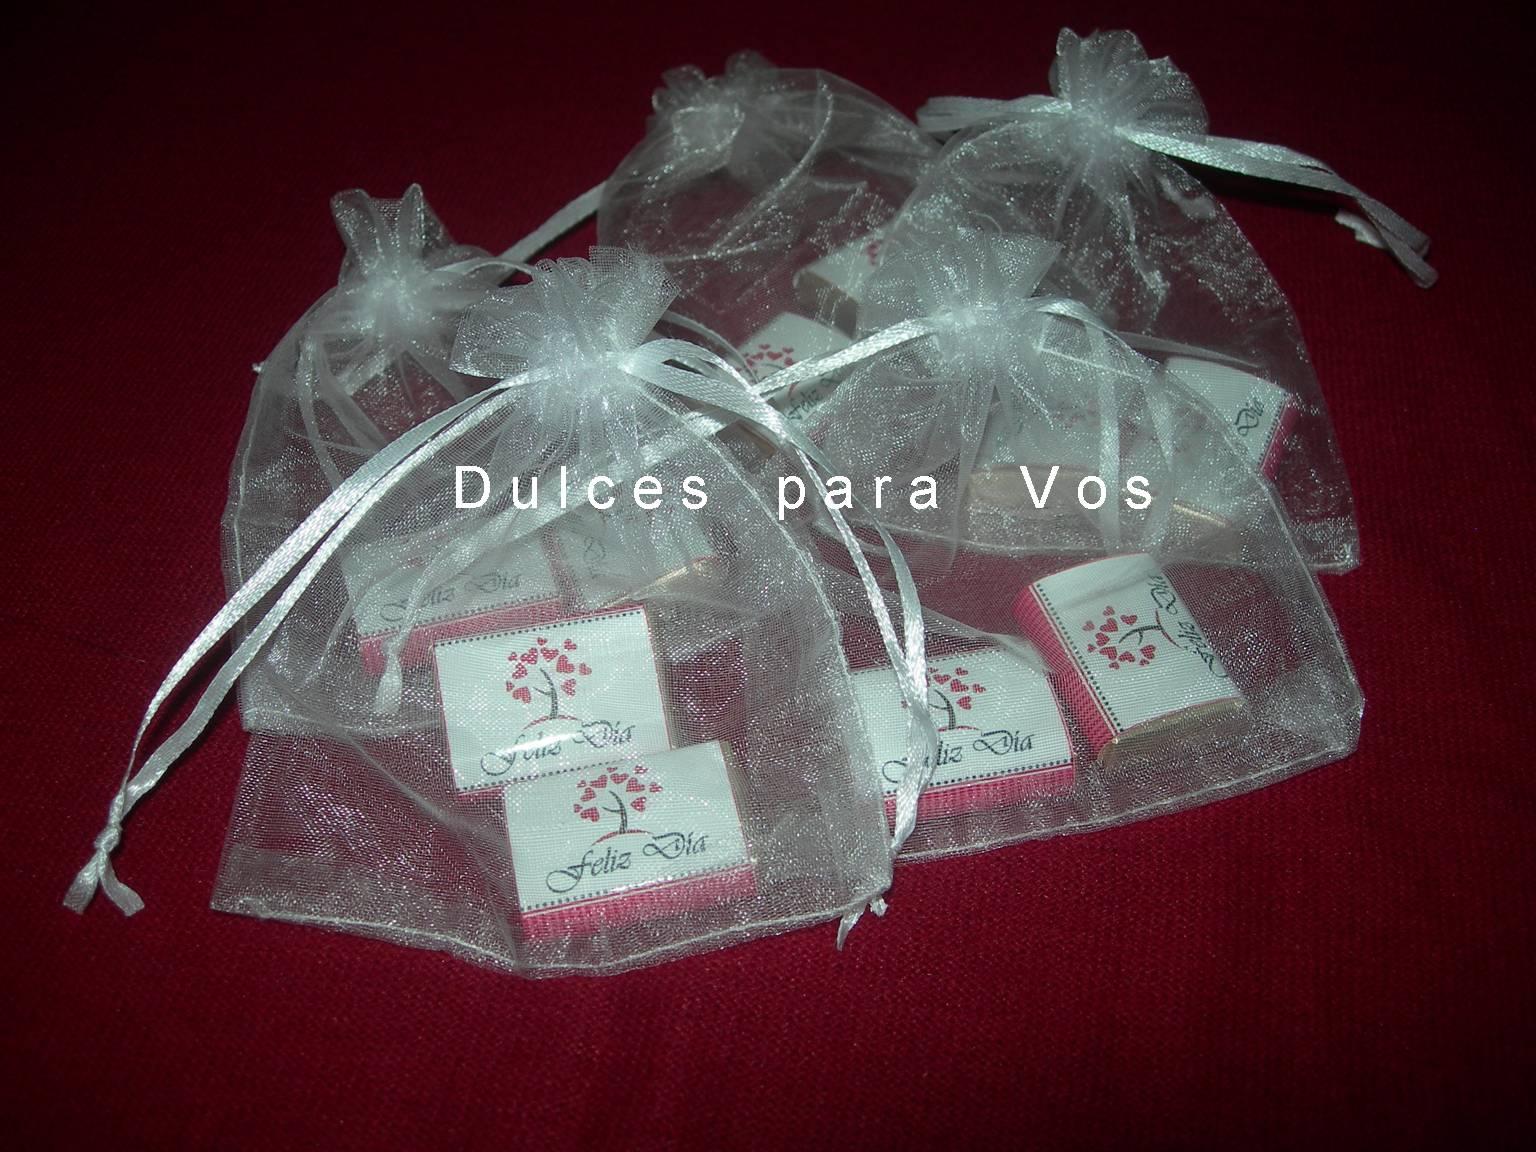 fb8d3ee88 Delicadas bolsitas de organza con dos chocolates con leche de 5grs.  personalizados. Souvenir económico para todo tipo de evento.